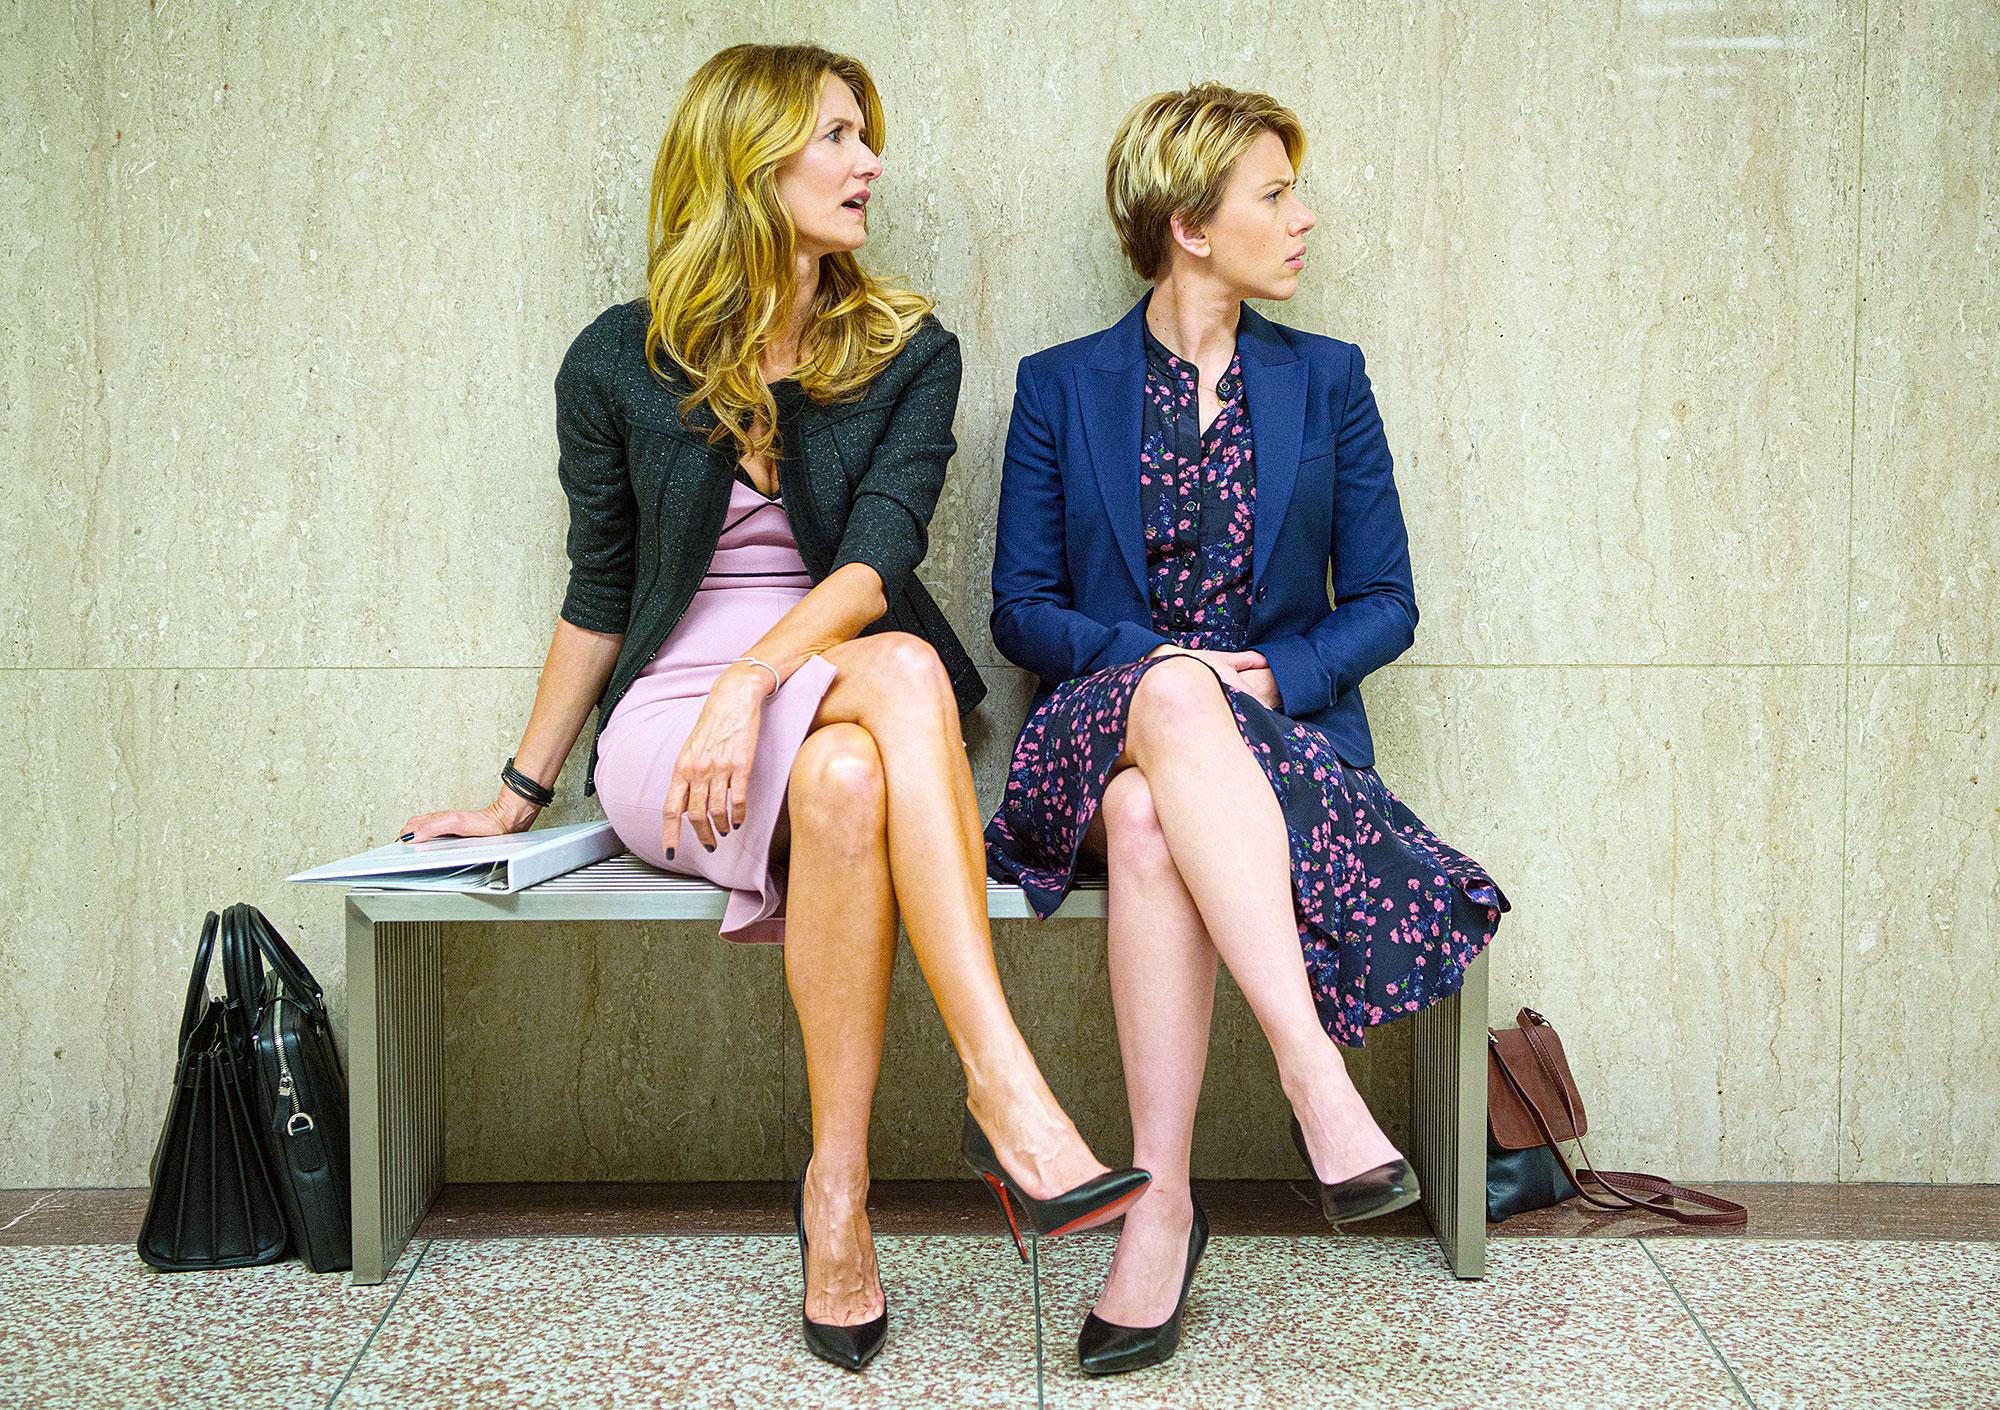 Laura Dern and Scarlett Johansson in Marriage Story Laura Dern reveals why she cried during Ellen Degeneres Golden Globes acceptance speech